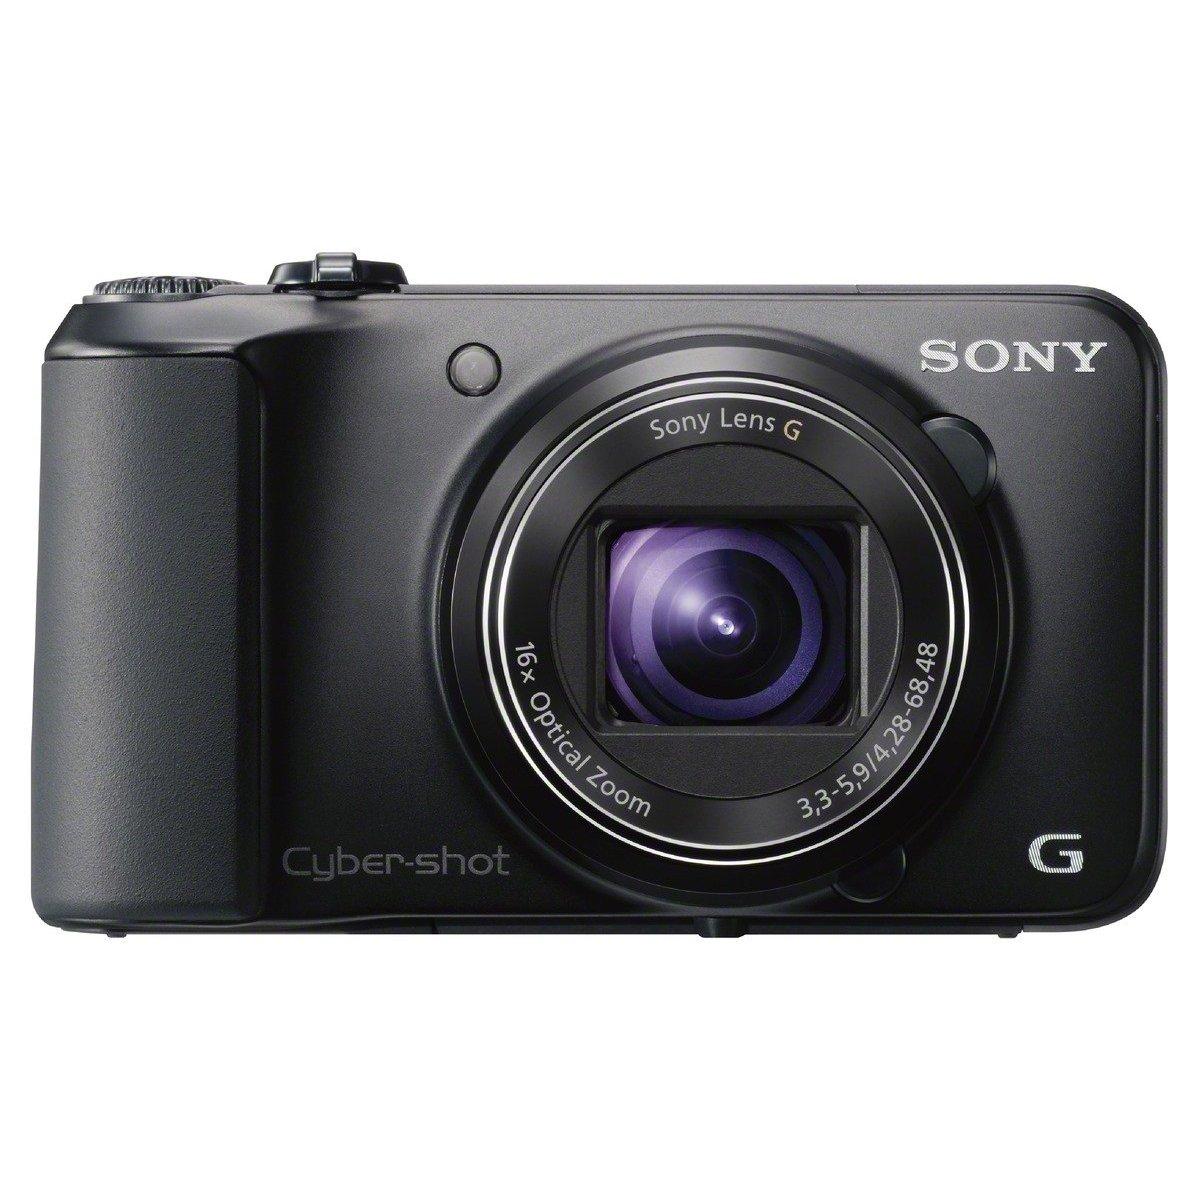 https://thetechjournal.com/wp-content/uploads/images/1203/1331531693-sony-cybershot-dsch90-161-mp-digital-camera-1.jpg